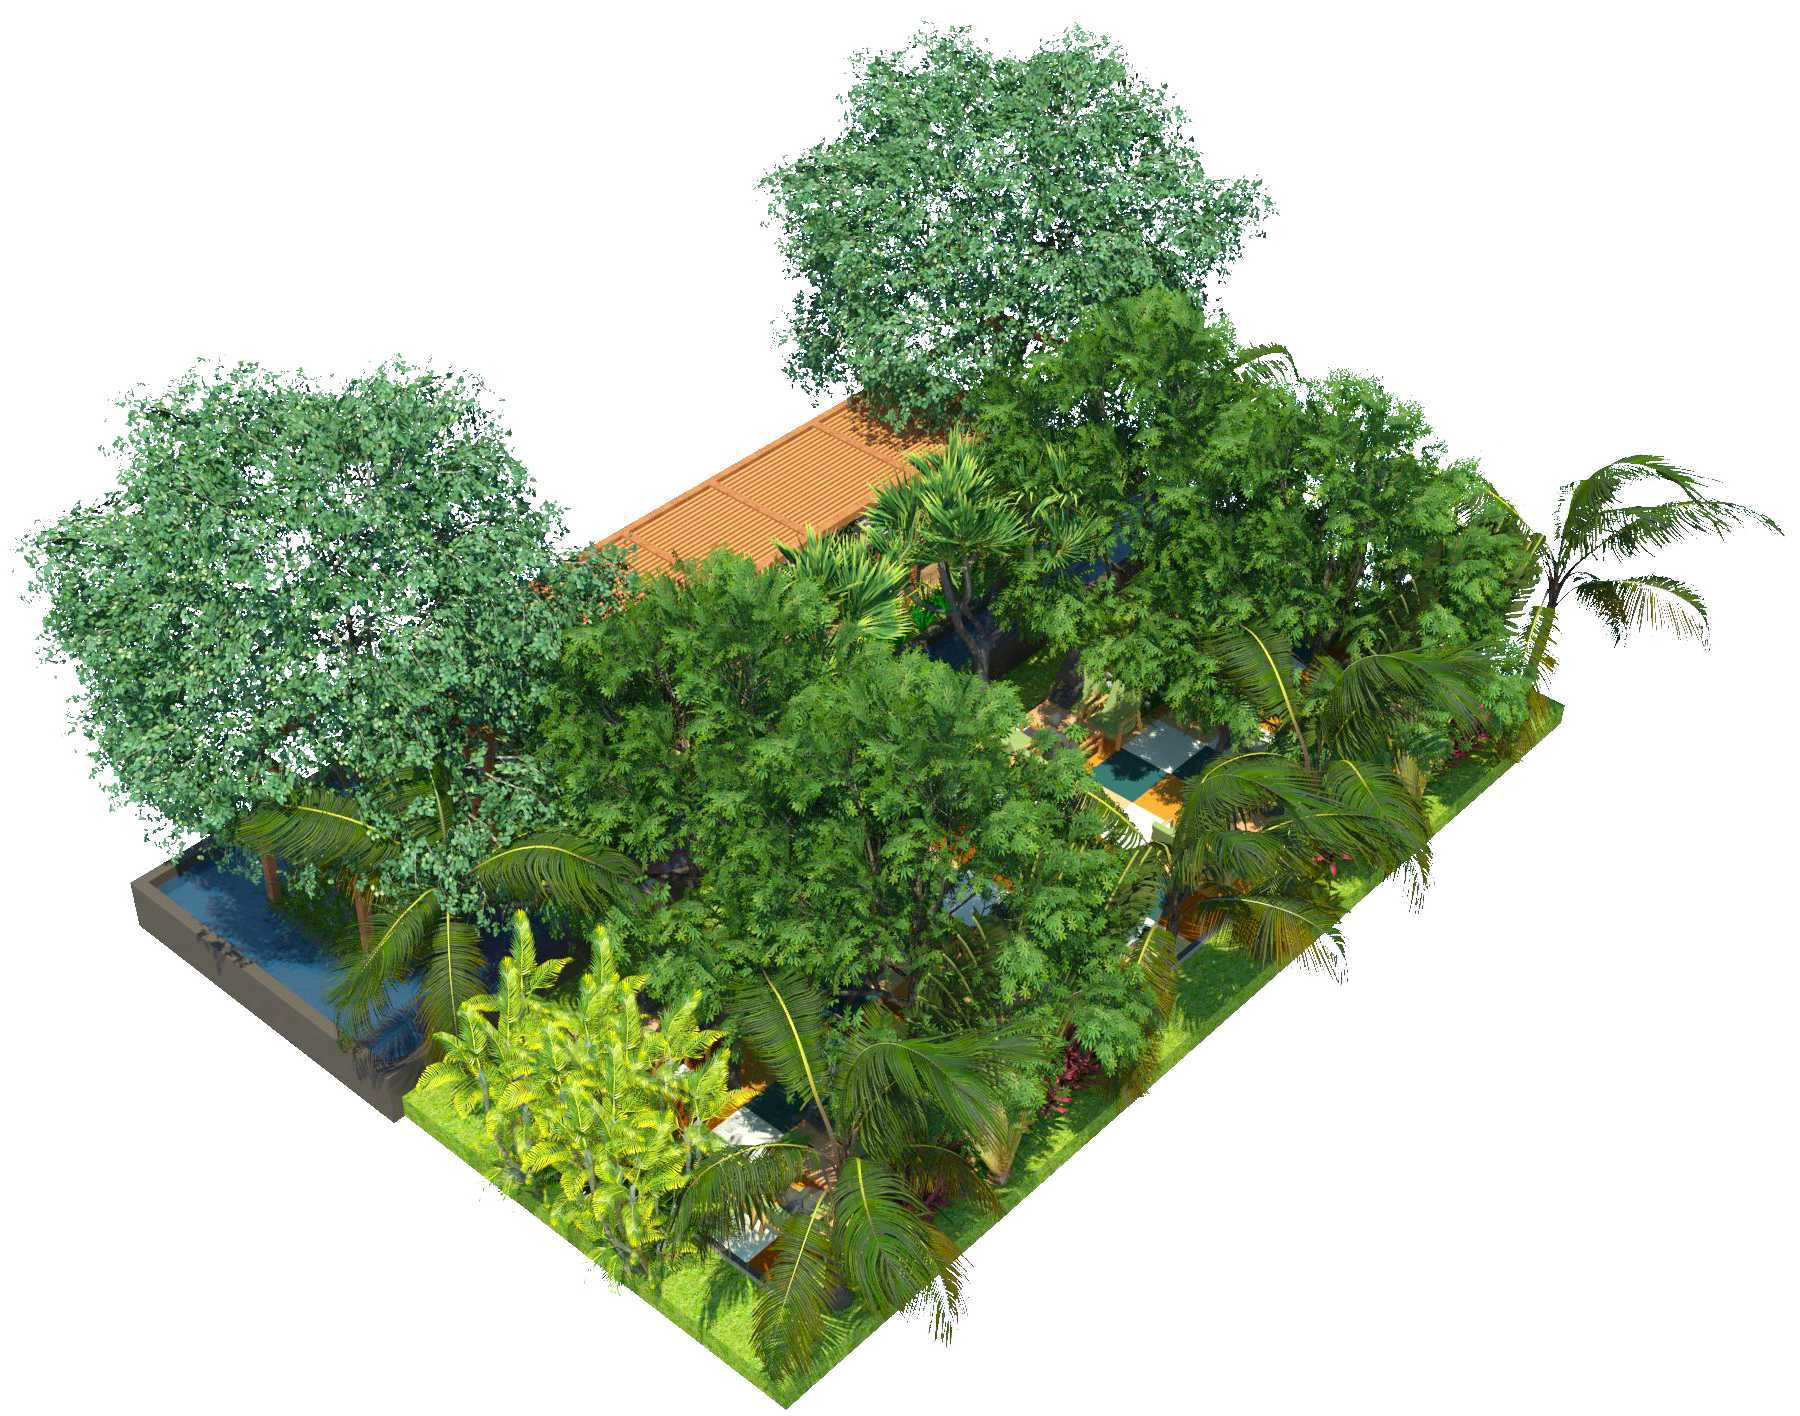 Verdant Incorporated Secret Garden Resto & Lounge Rangkui, Kota Pangkal Pinang, Kepulauan Bangka Belitung, Indonesia Rangkui, Kota Pangkal Pinang, Kepulauan Bangka Belitung, Indonesia Bird Eye View Tropis  52528